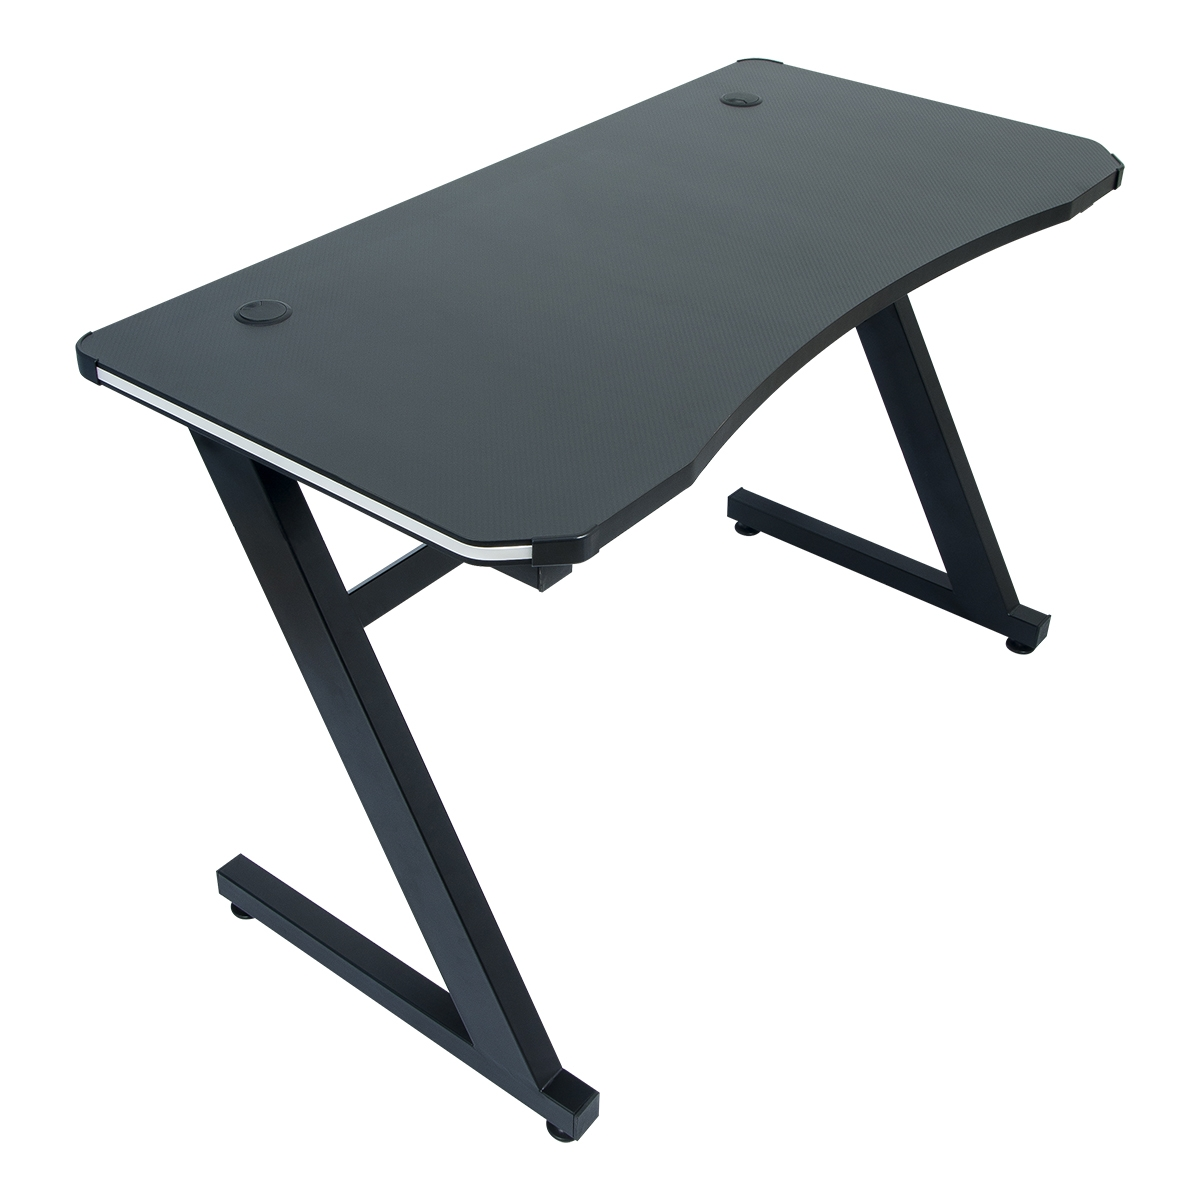 Conjunto Mesa Gamer LED Pelegrin PEL-007P Preta e Cadeira Gamer Pelegrin PEL-3005 Azul, Branca e Preta